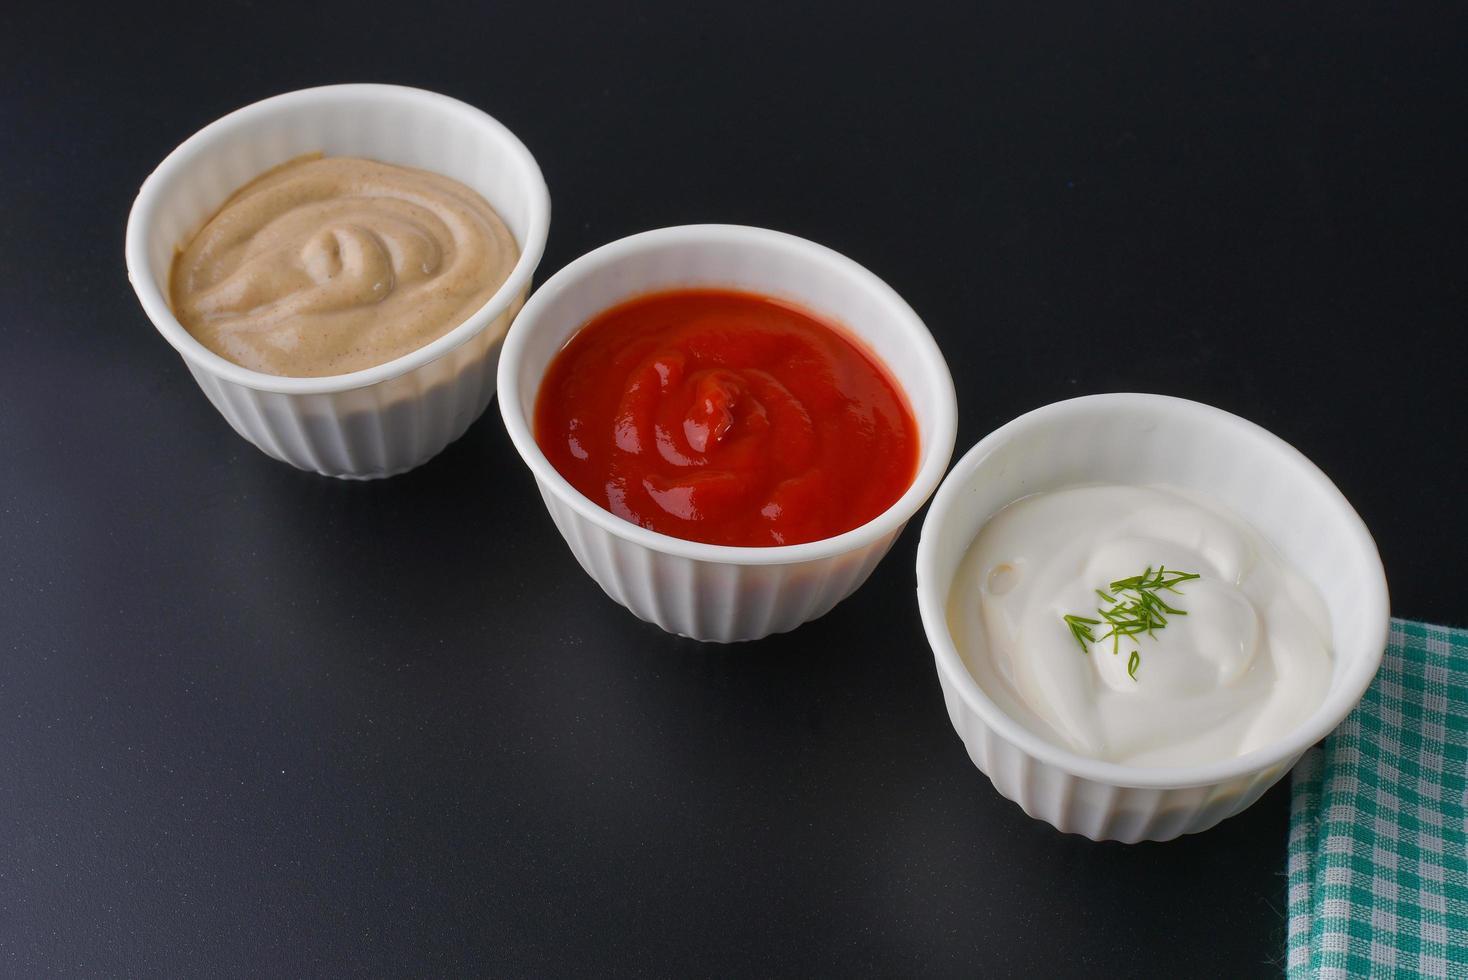 Sauces on black background photo